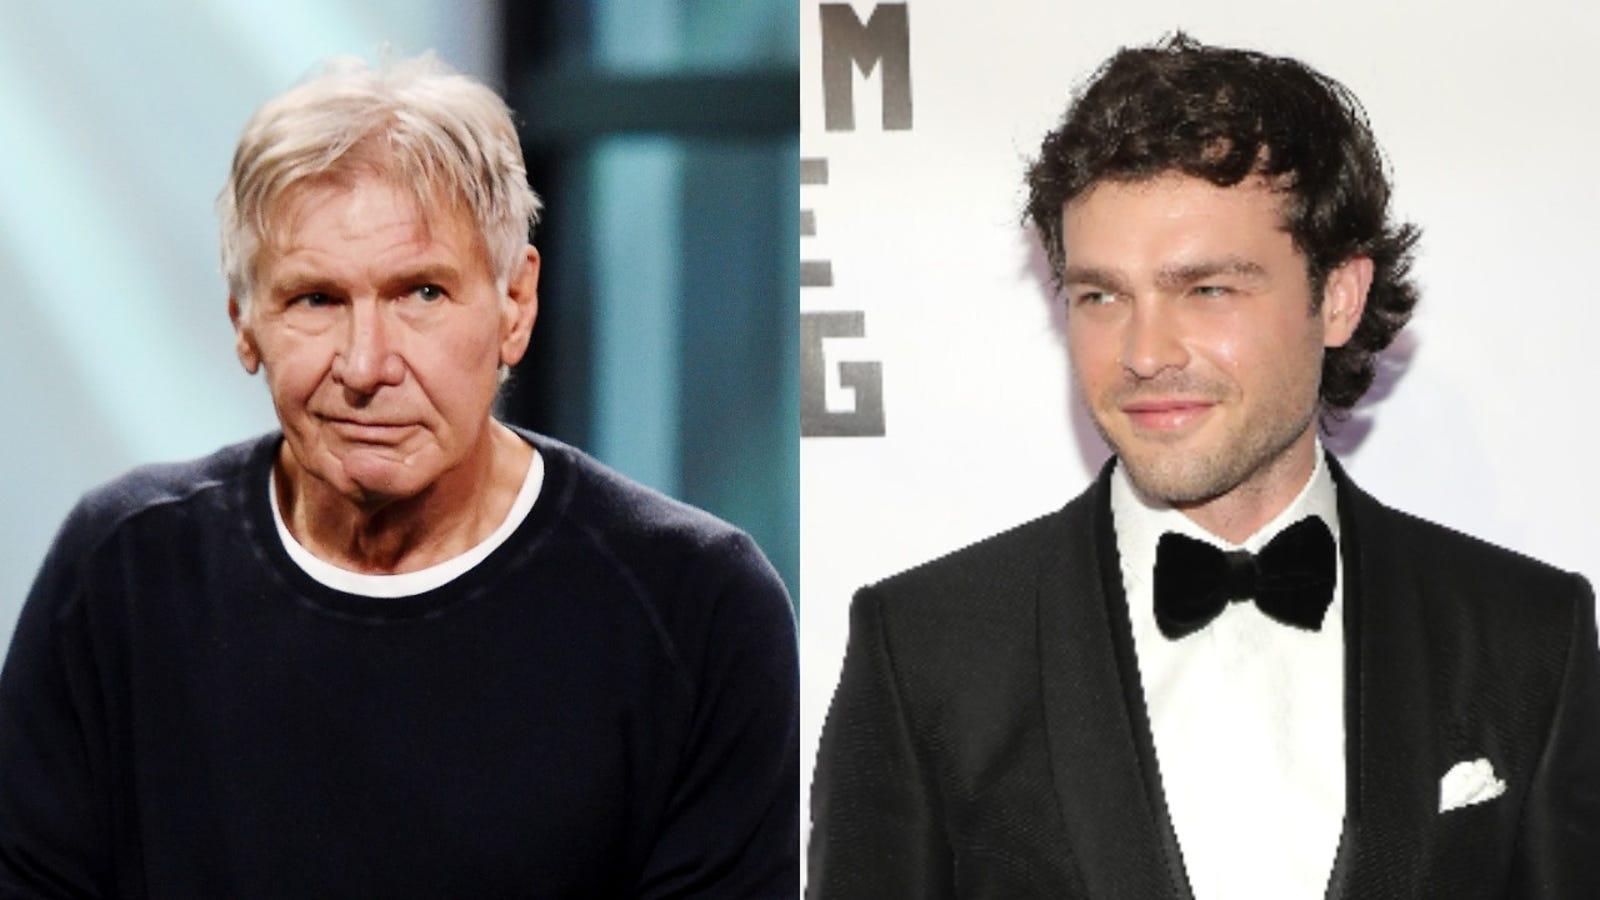 Hero Harrison Ford may die in the new series of Star Wars 02/19/2015 31